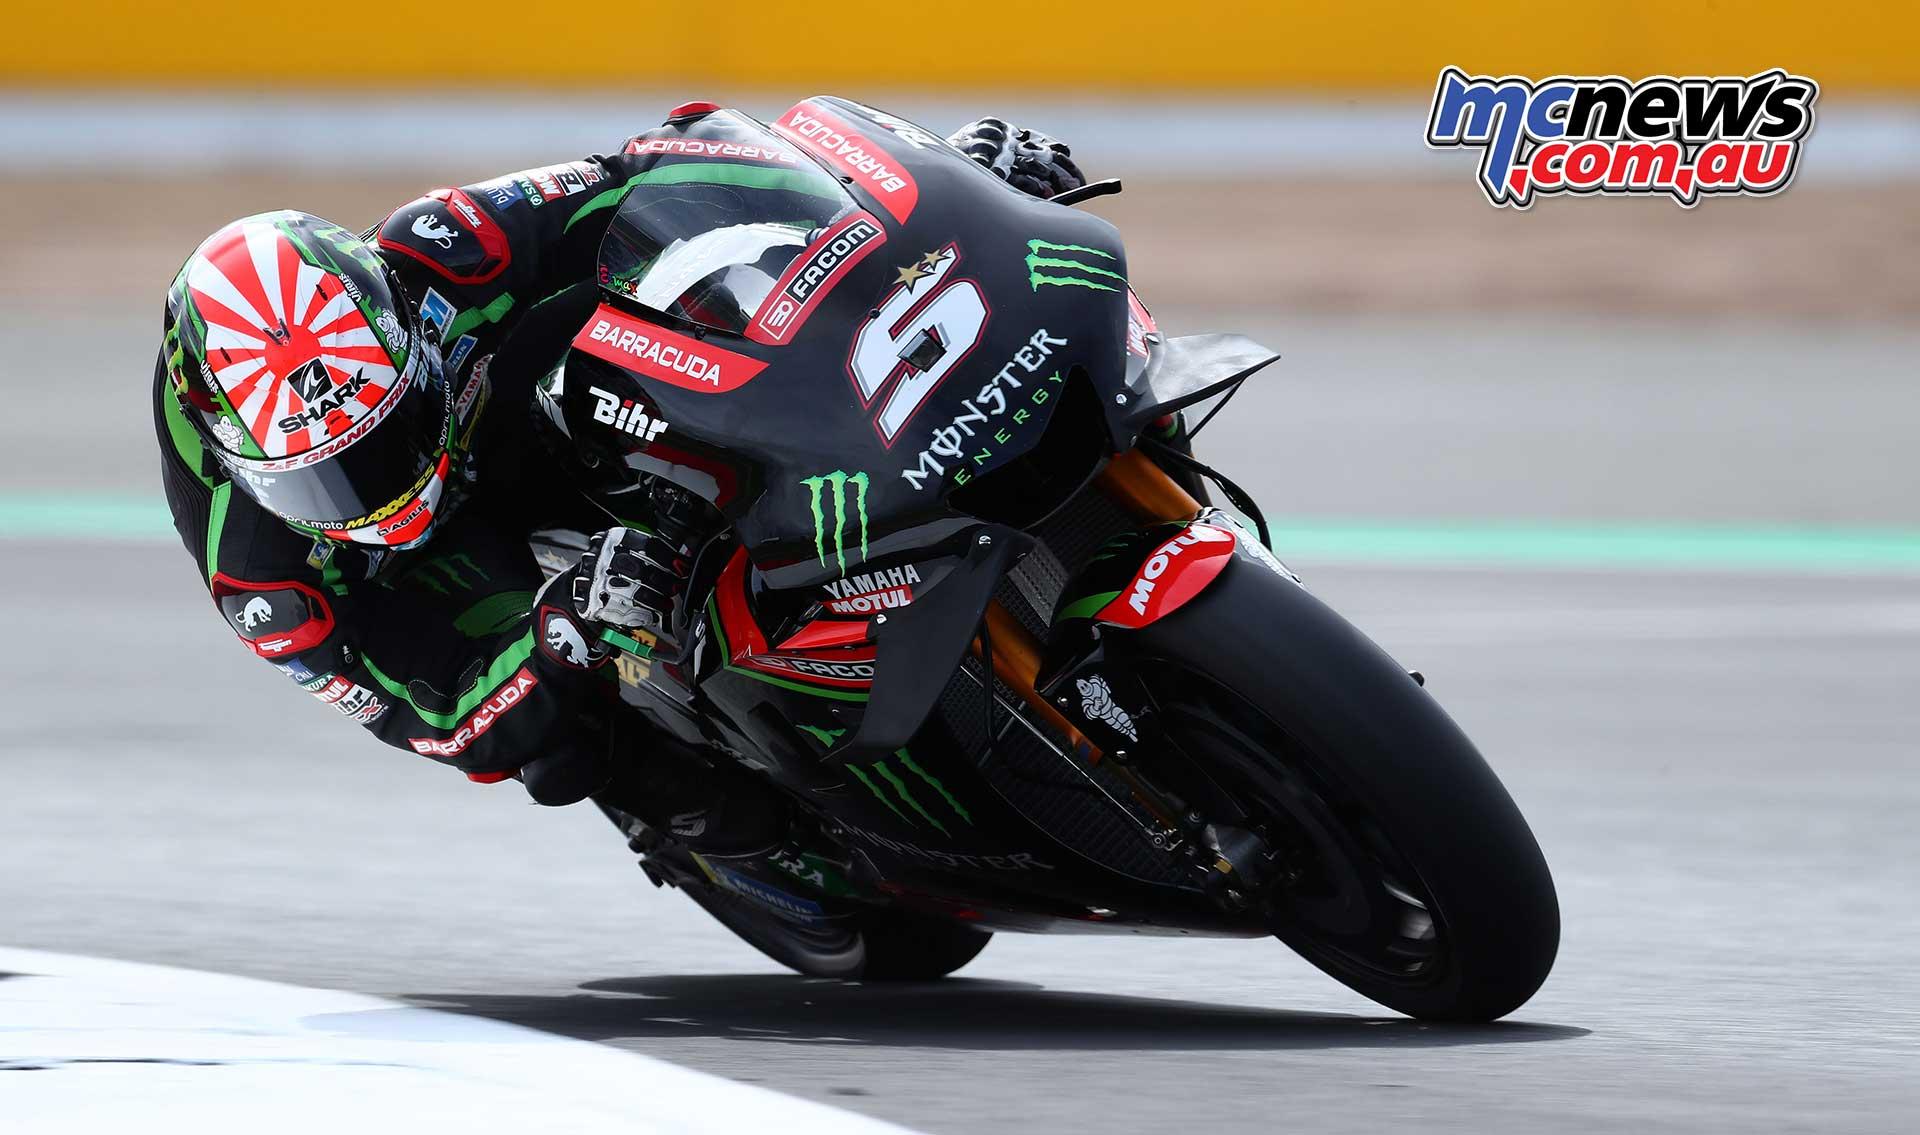 2018 Silverstone MotoGP | Gallery B | MCNews.com.au